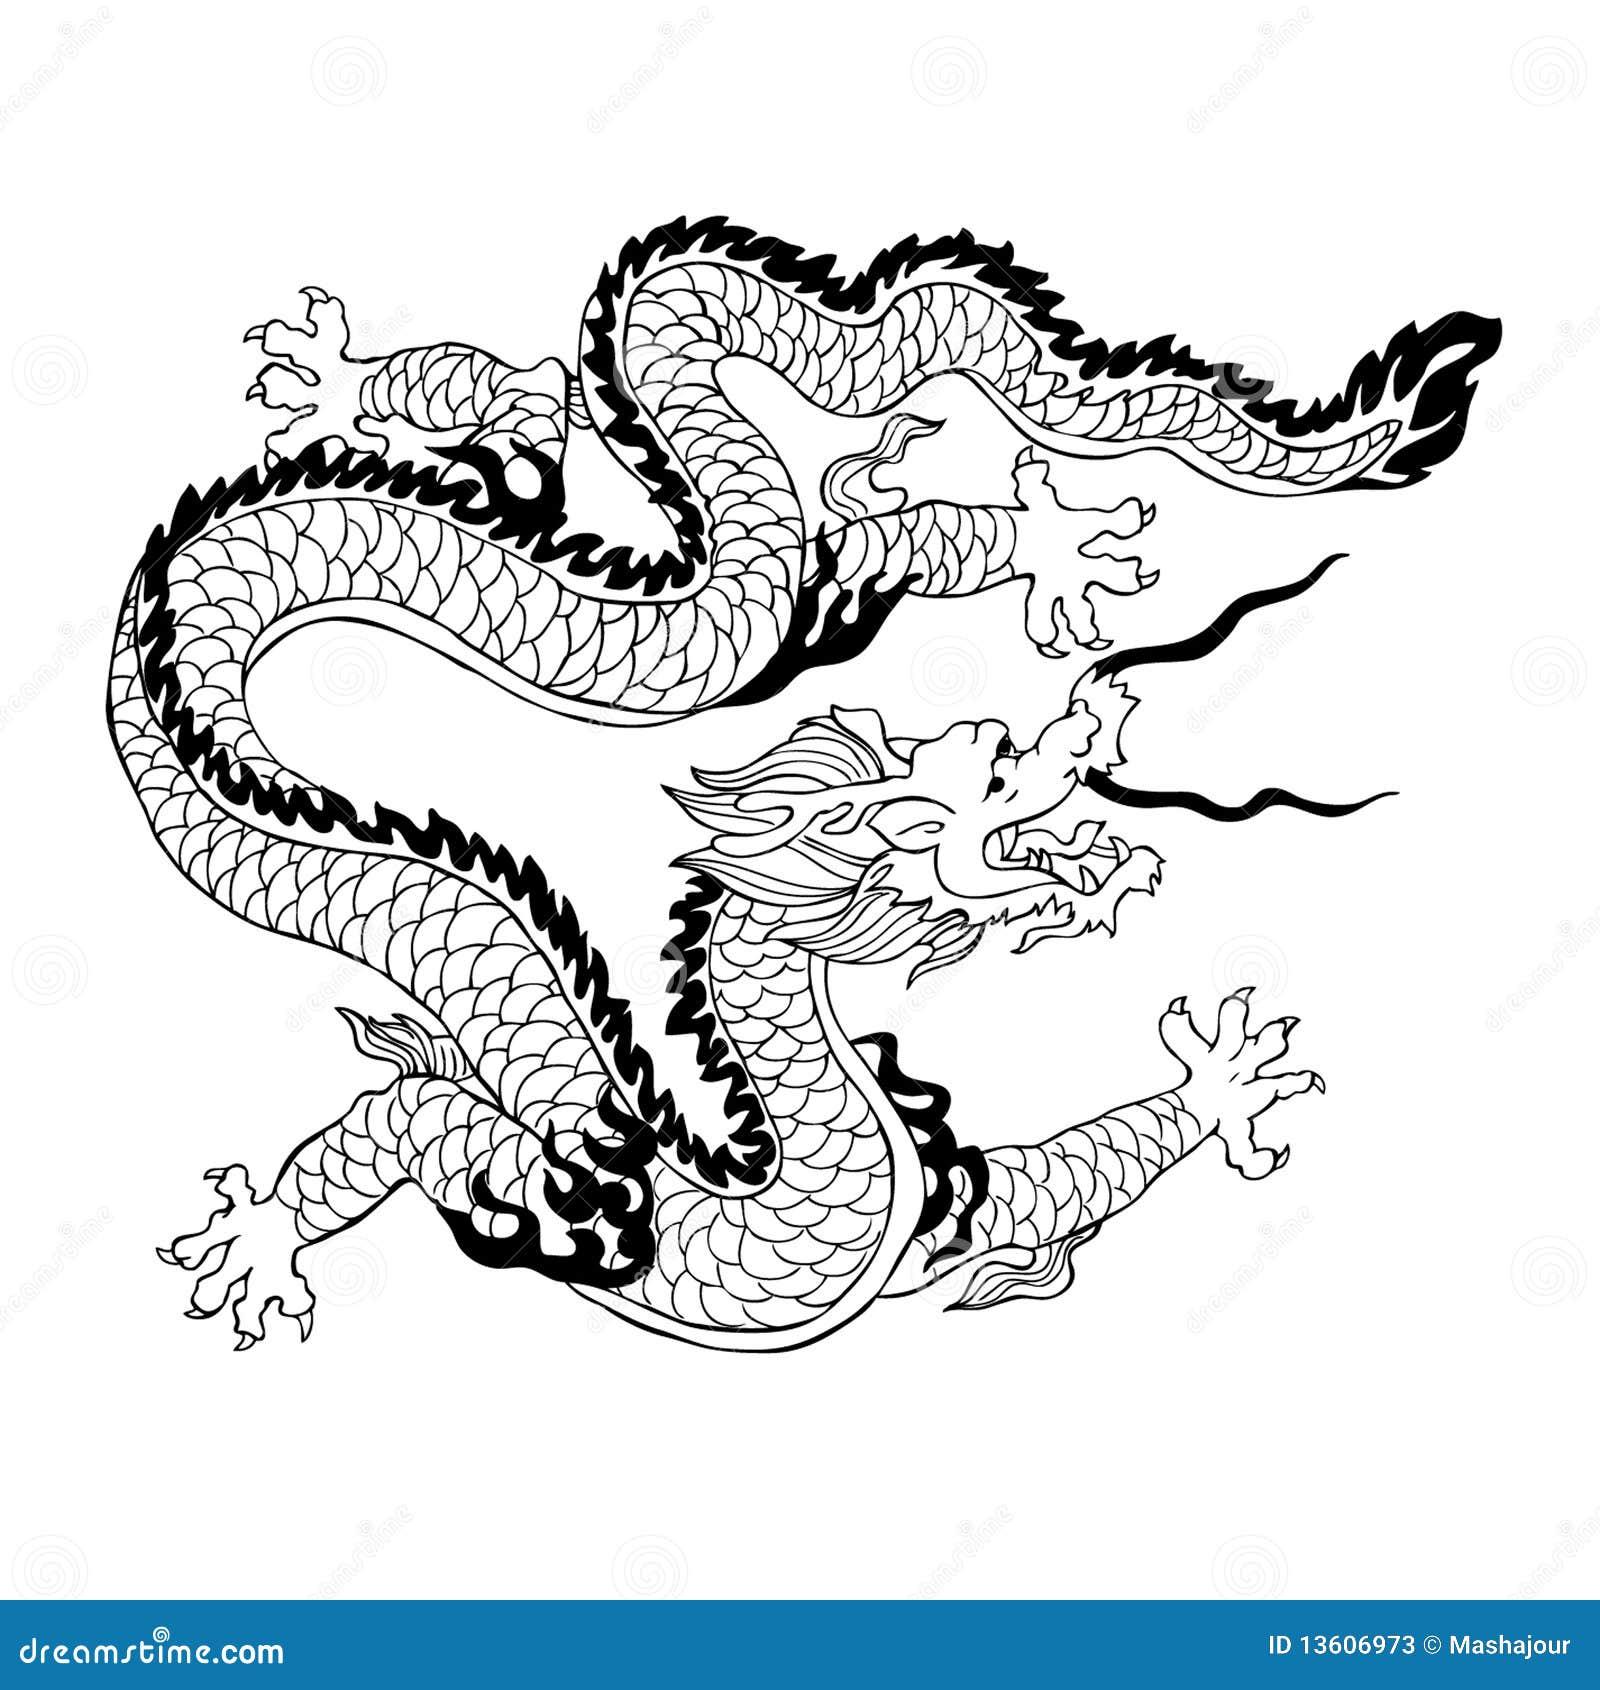 Chinese Dragon Stock Photos - Image: 13606973